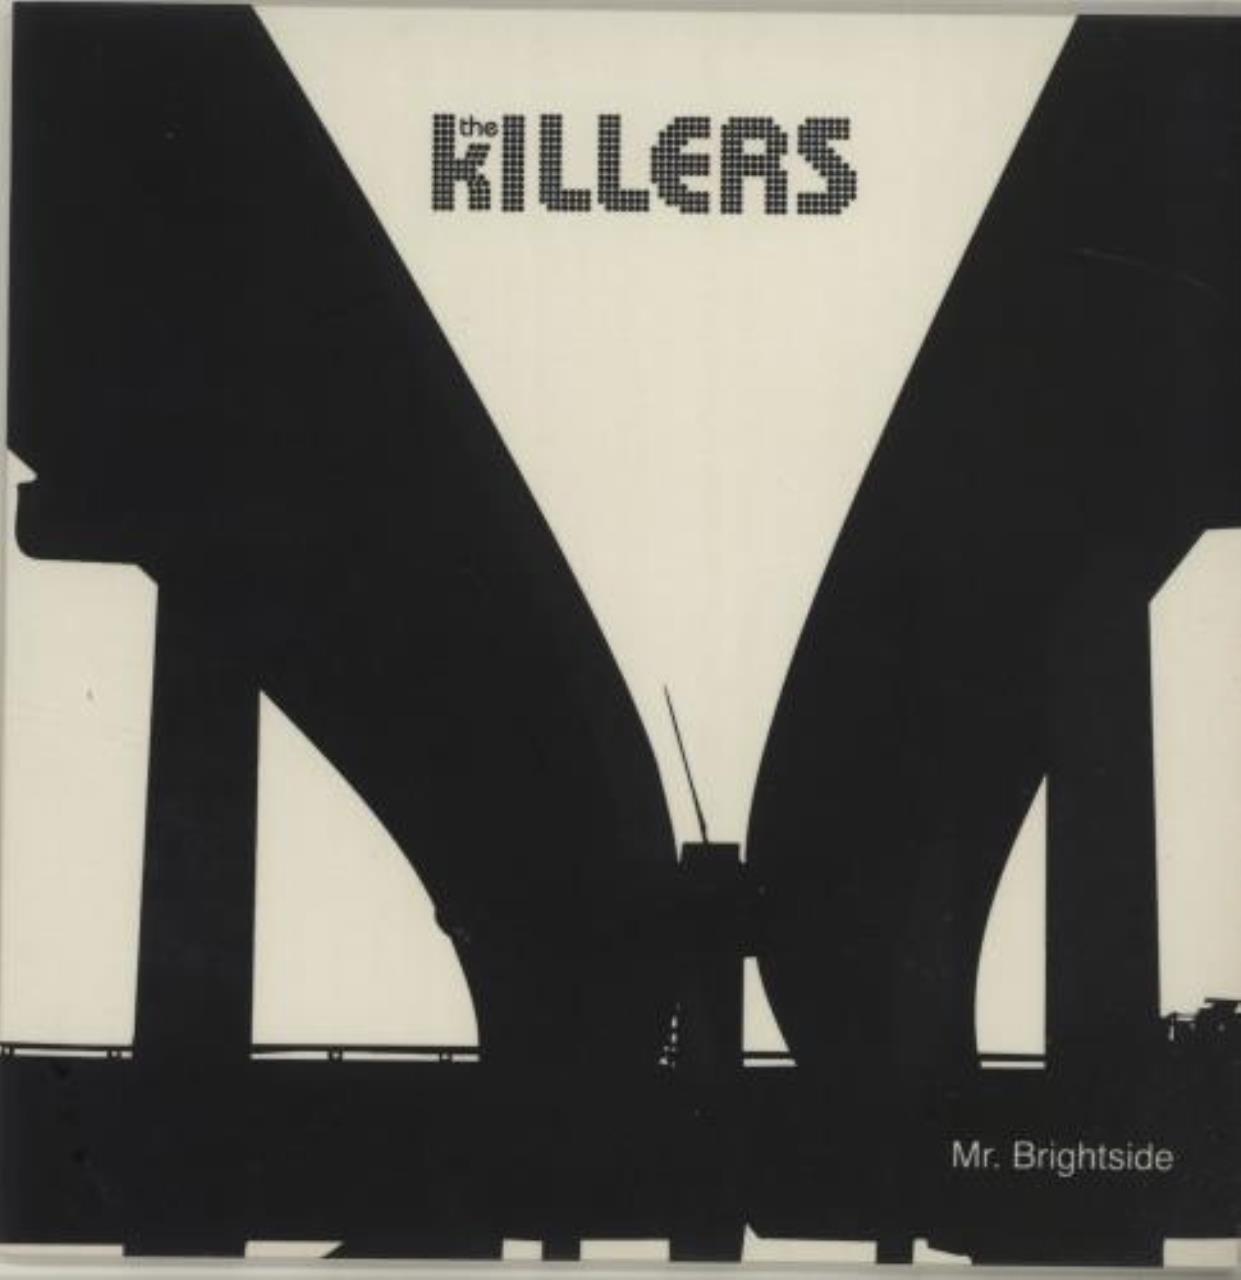 Mr Brightside 7 Vinyl Amazon Music